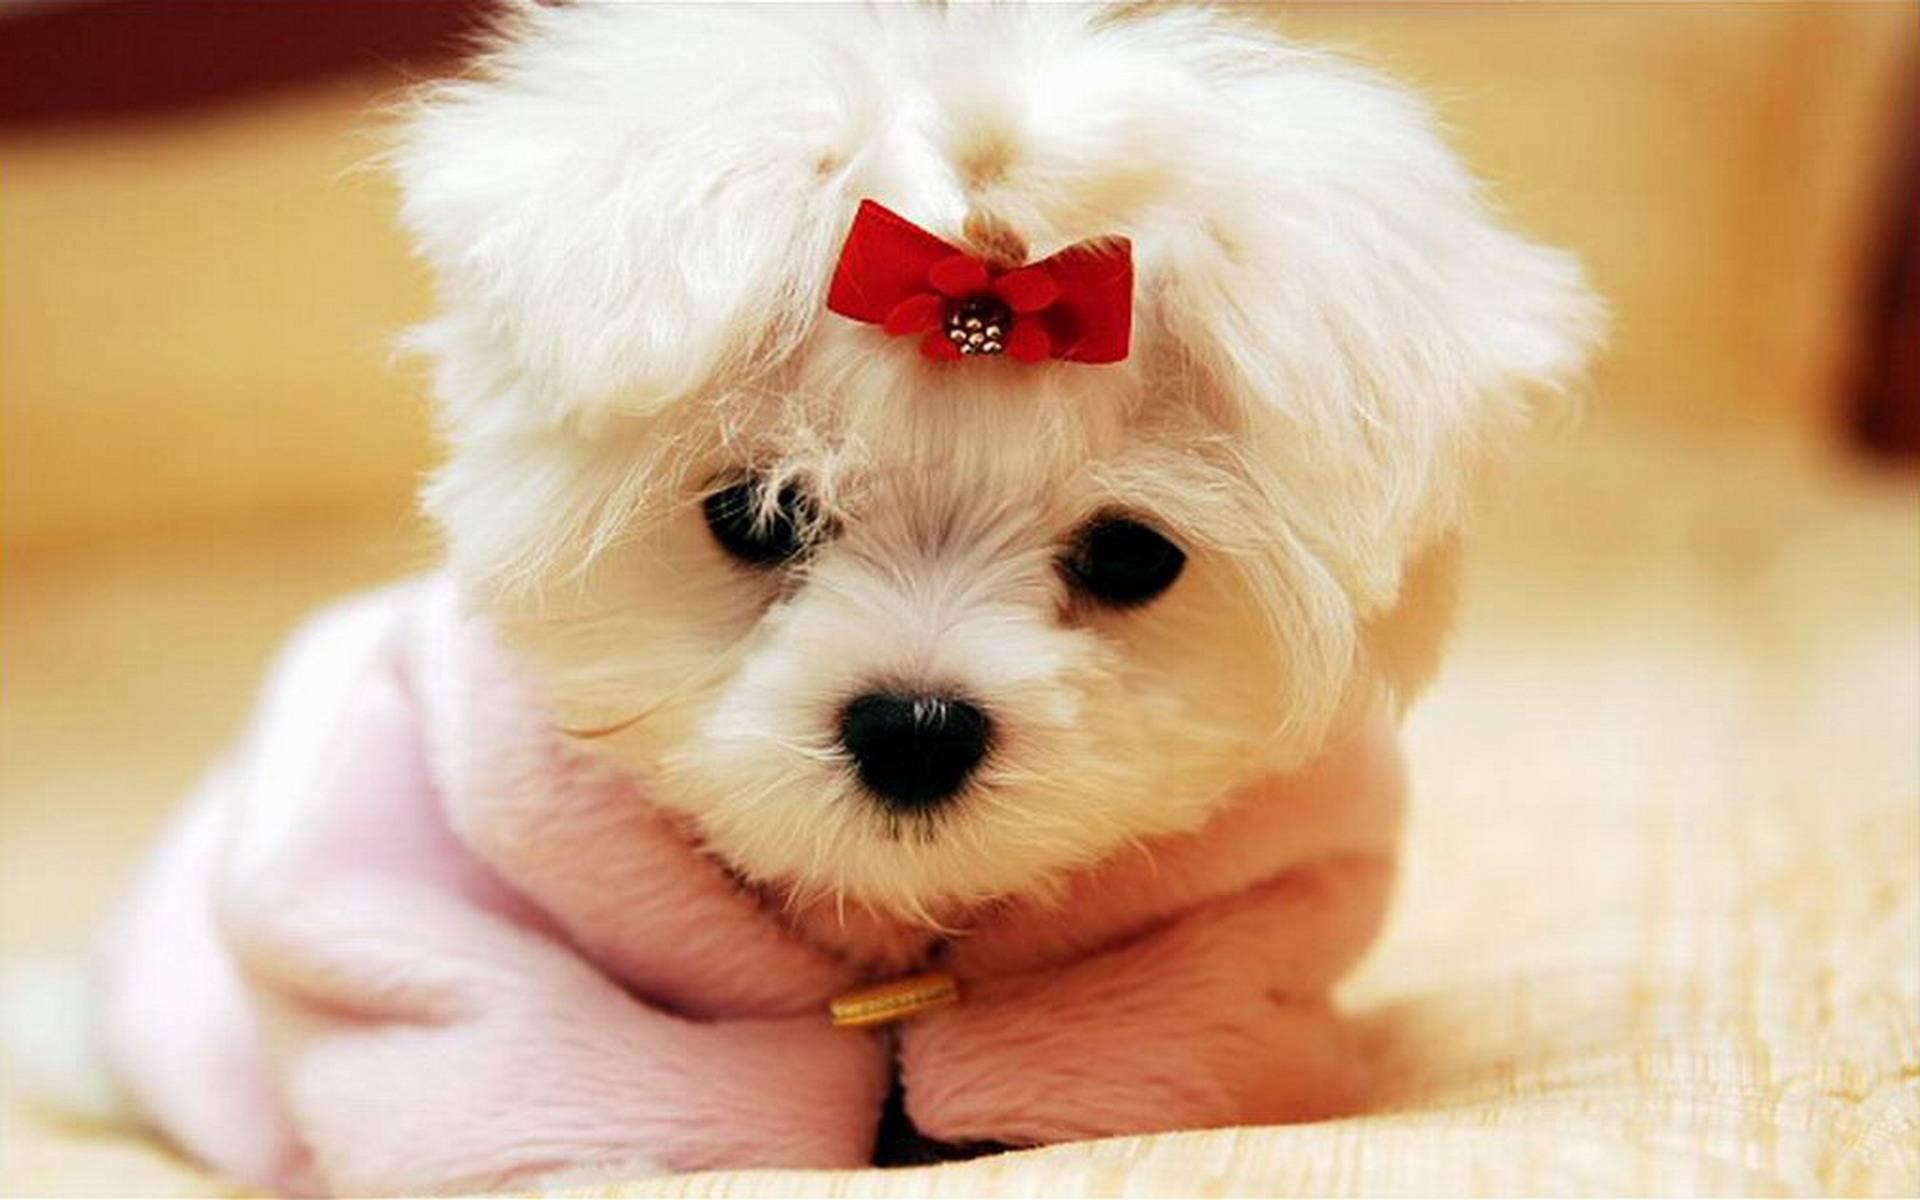 339463 dogs cute dog michael bradley   time traveler